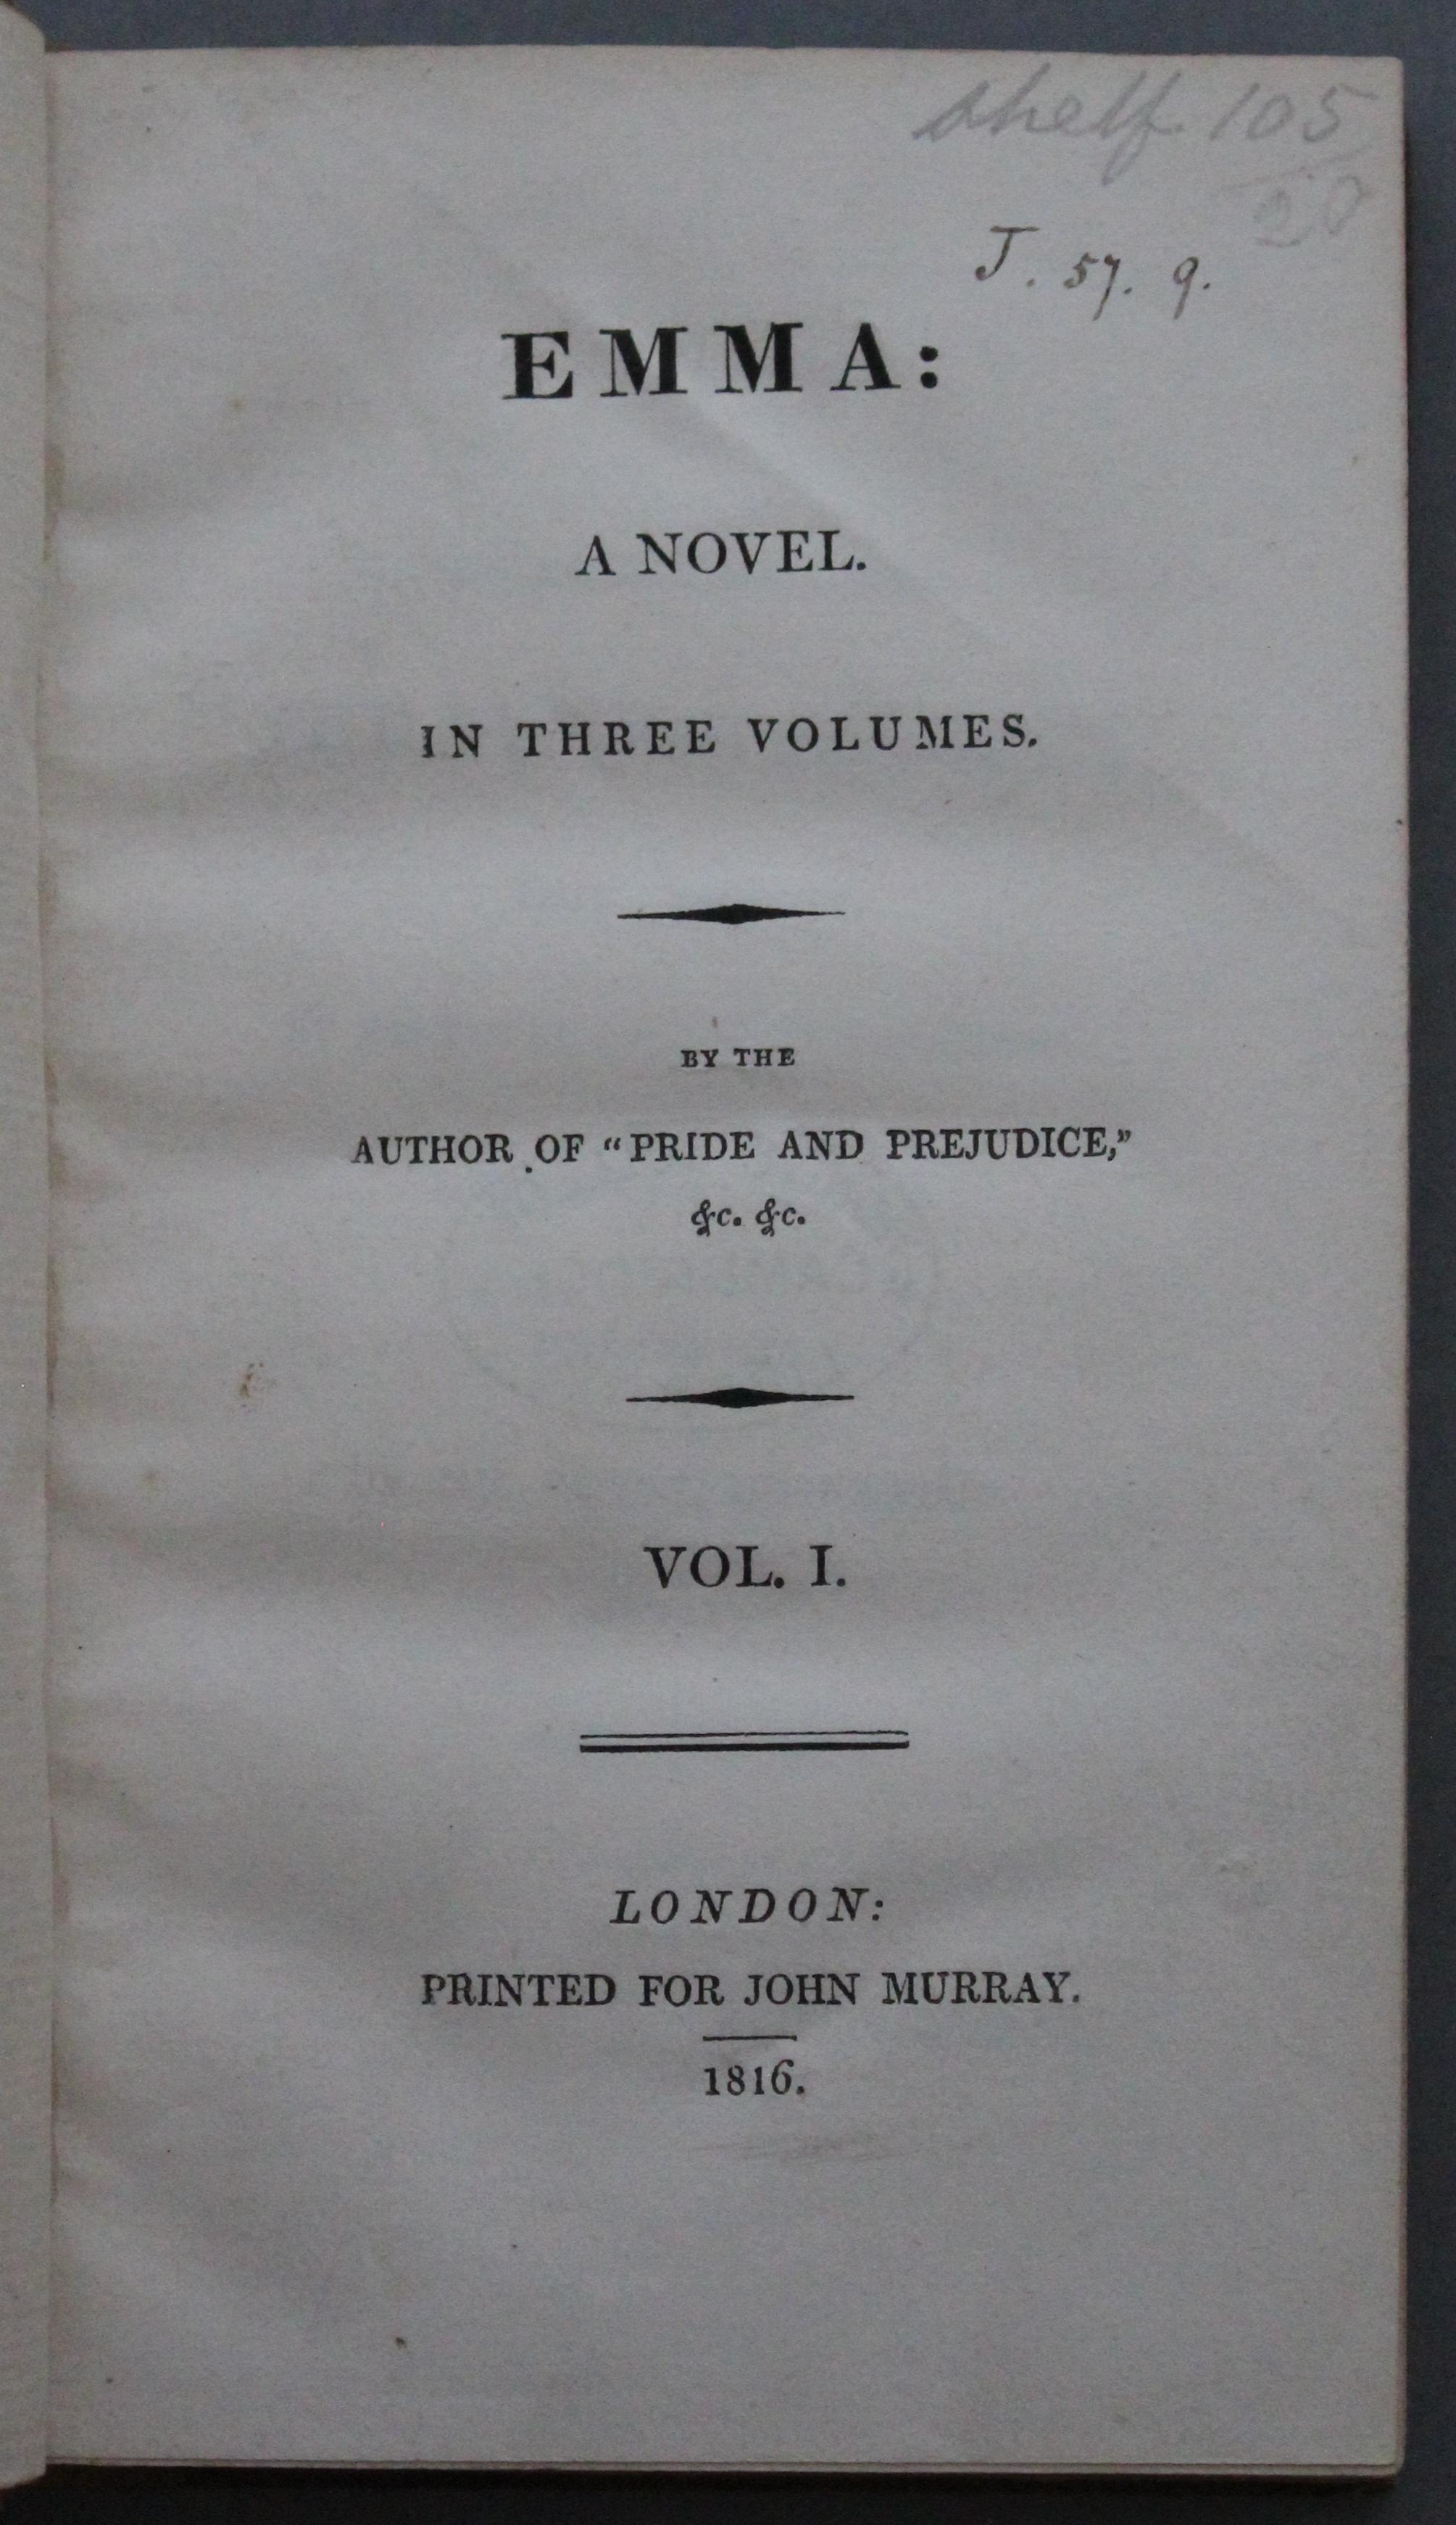 Thackeray.J.57.10 title page